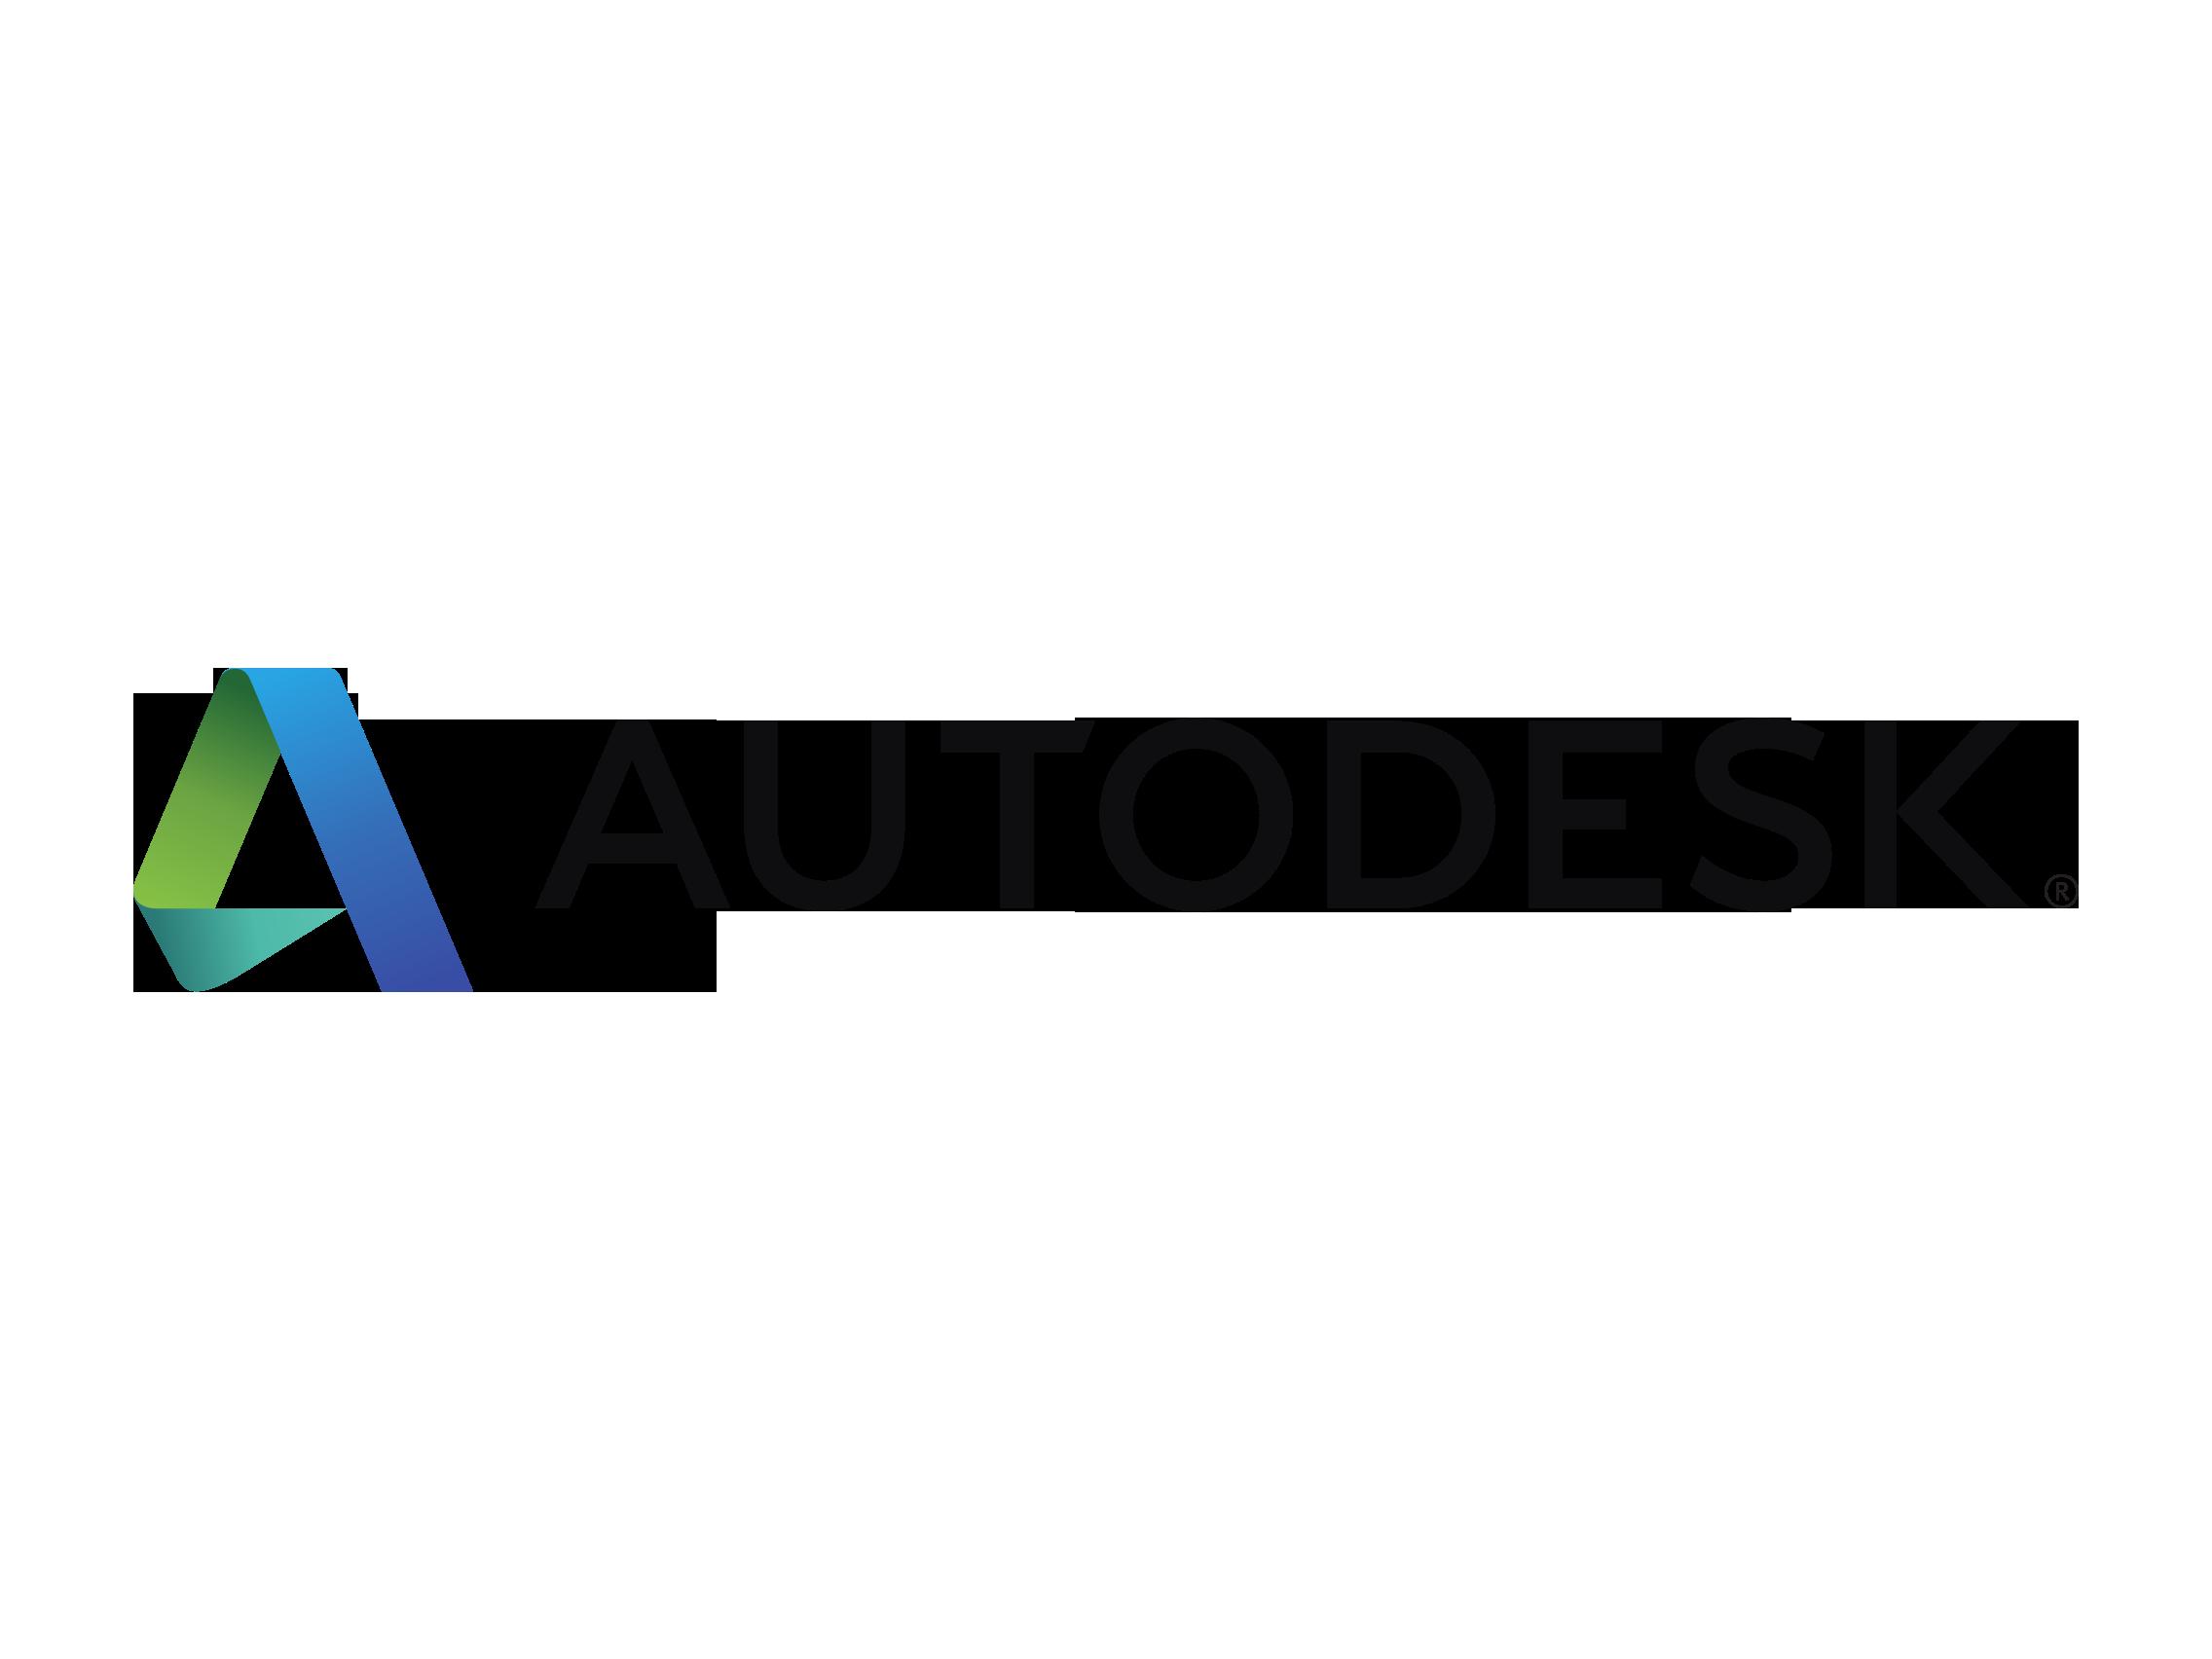 Autodesk-logo-and-wordmark.png